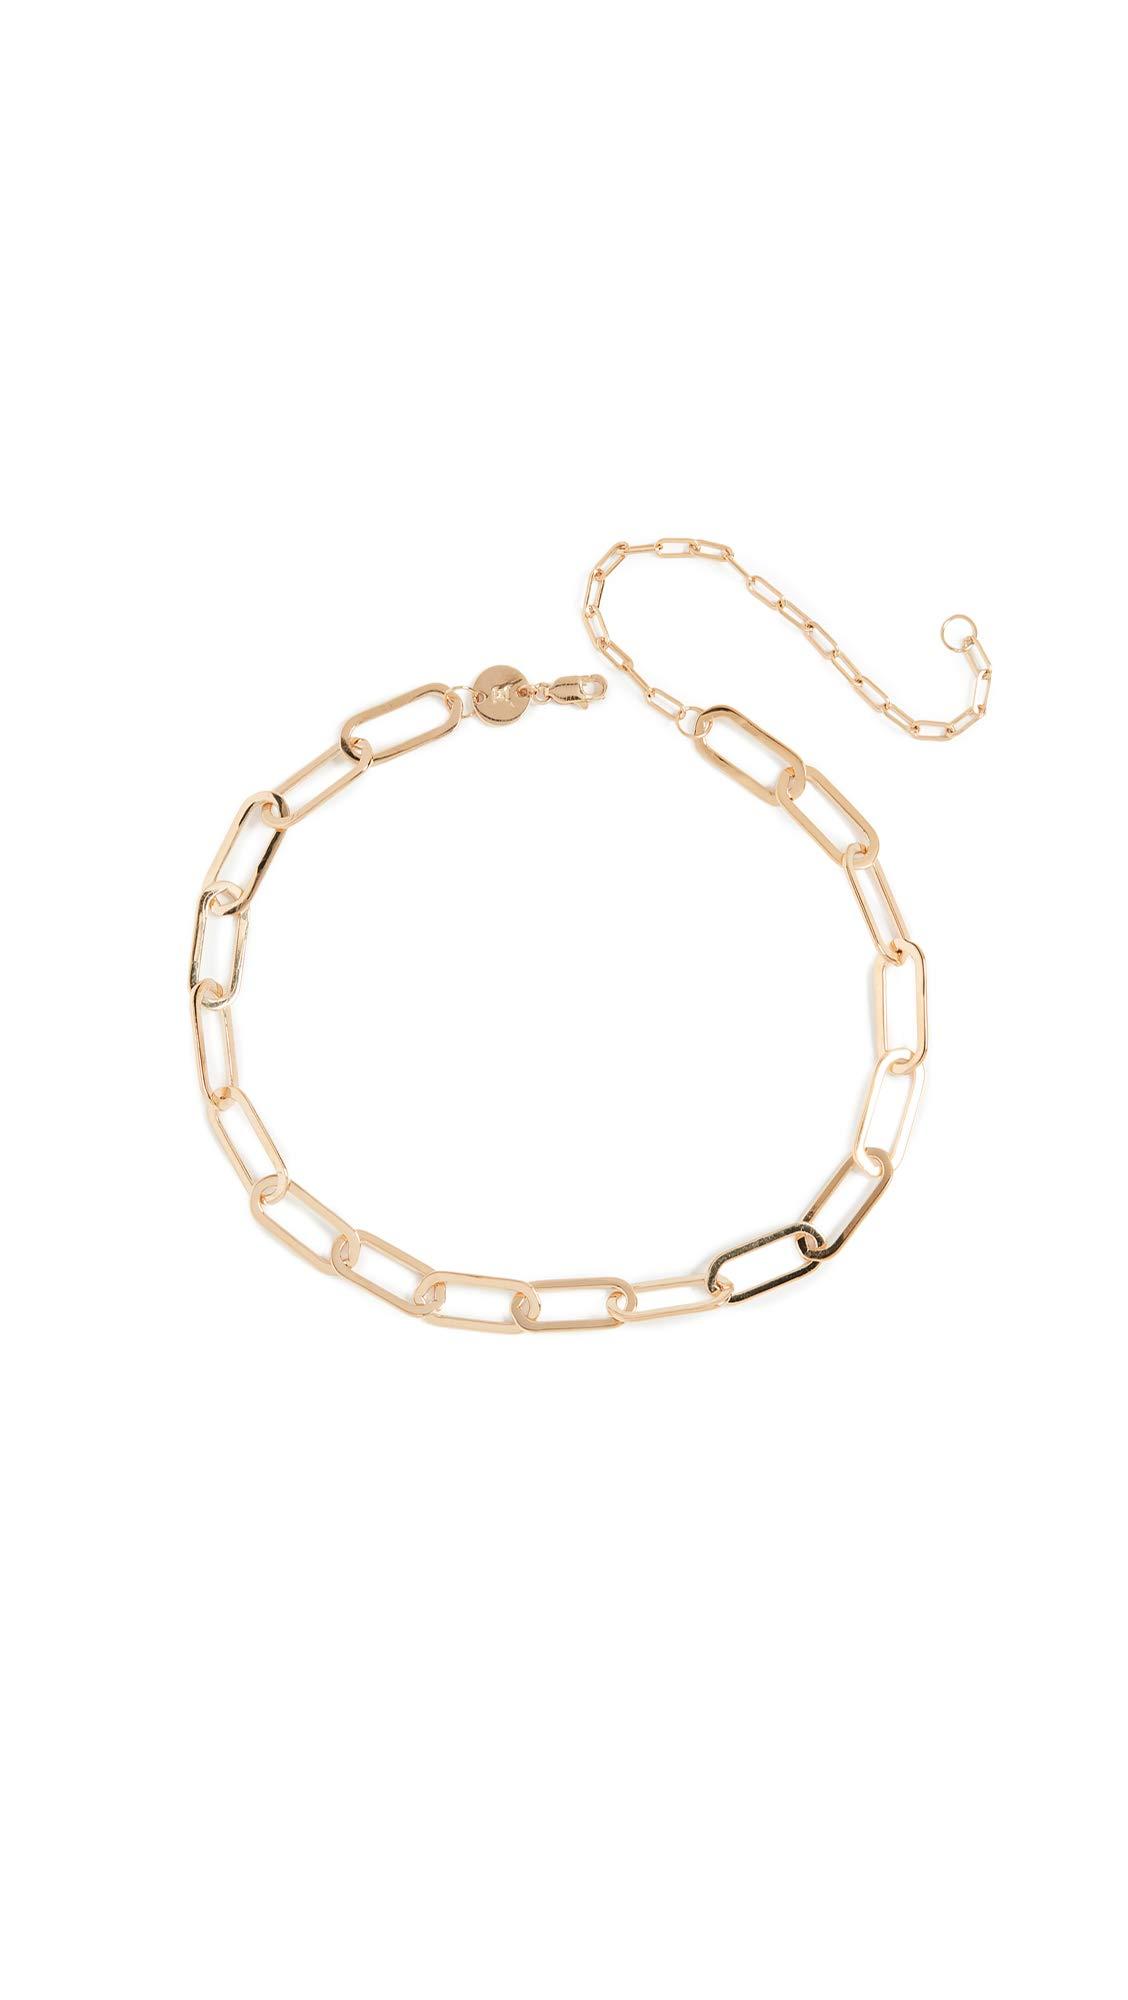 Jennifer Zeuner Jewelry Women's Marta Necklace, Yellow Vermeil, One Size